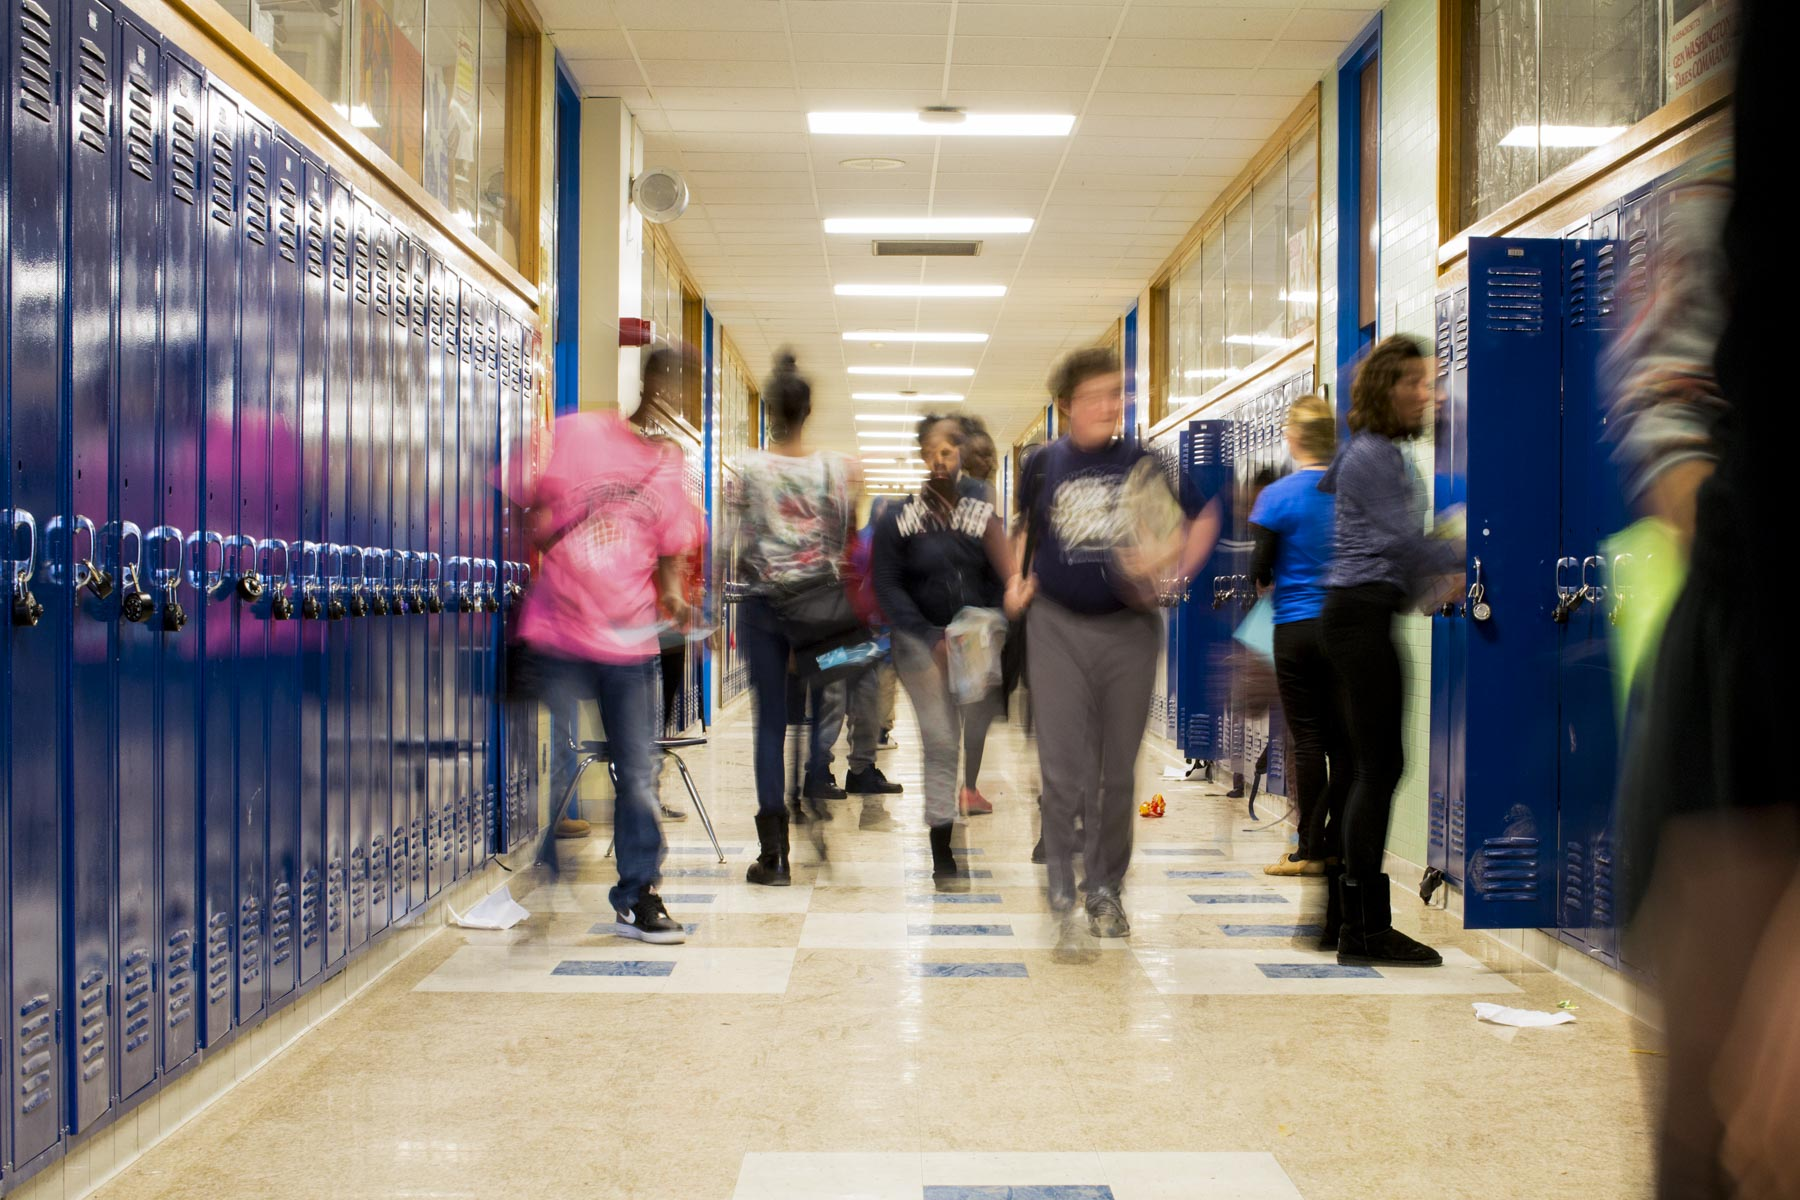 Students_Random_0065.jpg